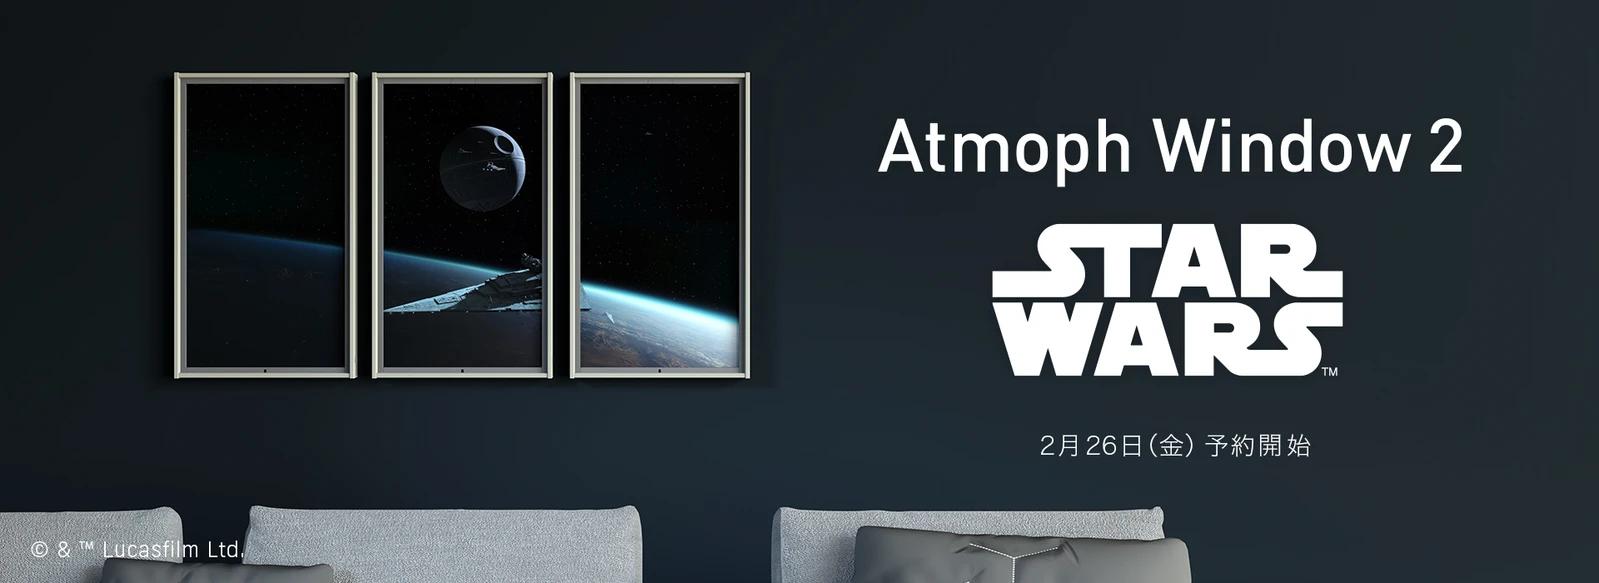 starwars model